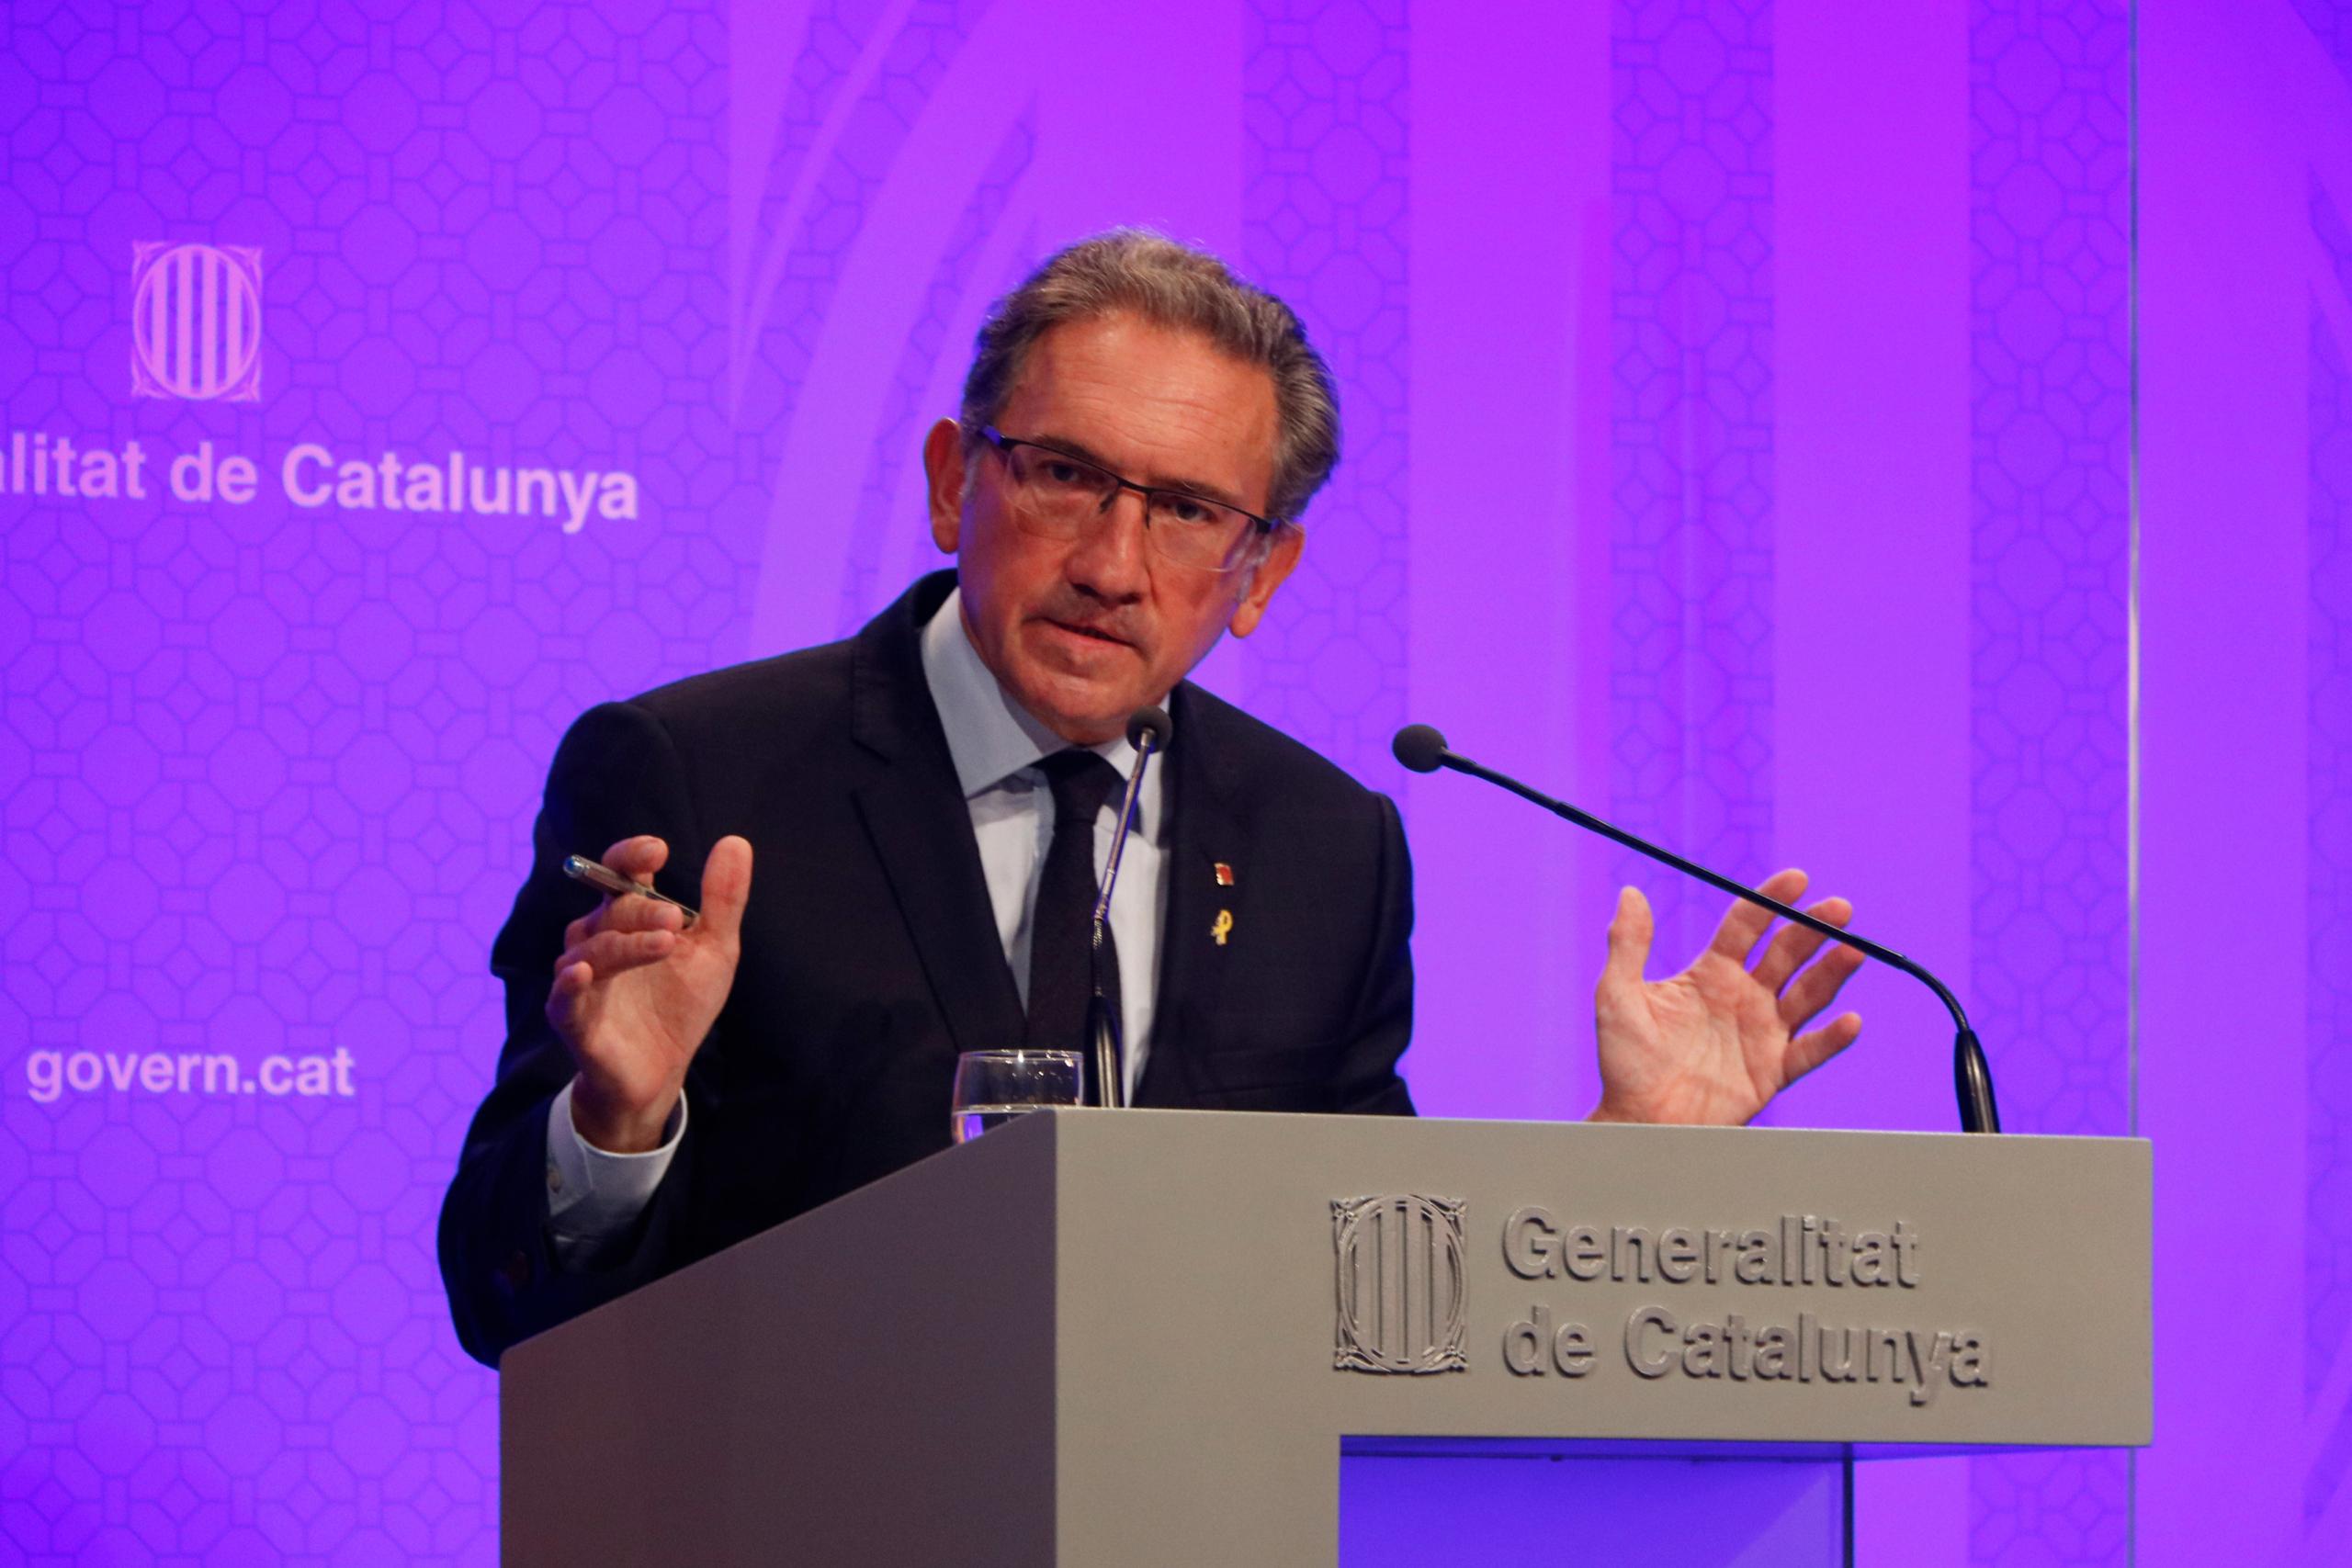 El conseller d'Economia i Hisenda, Jaume Giró | ACN